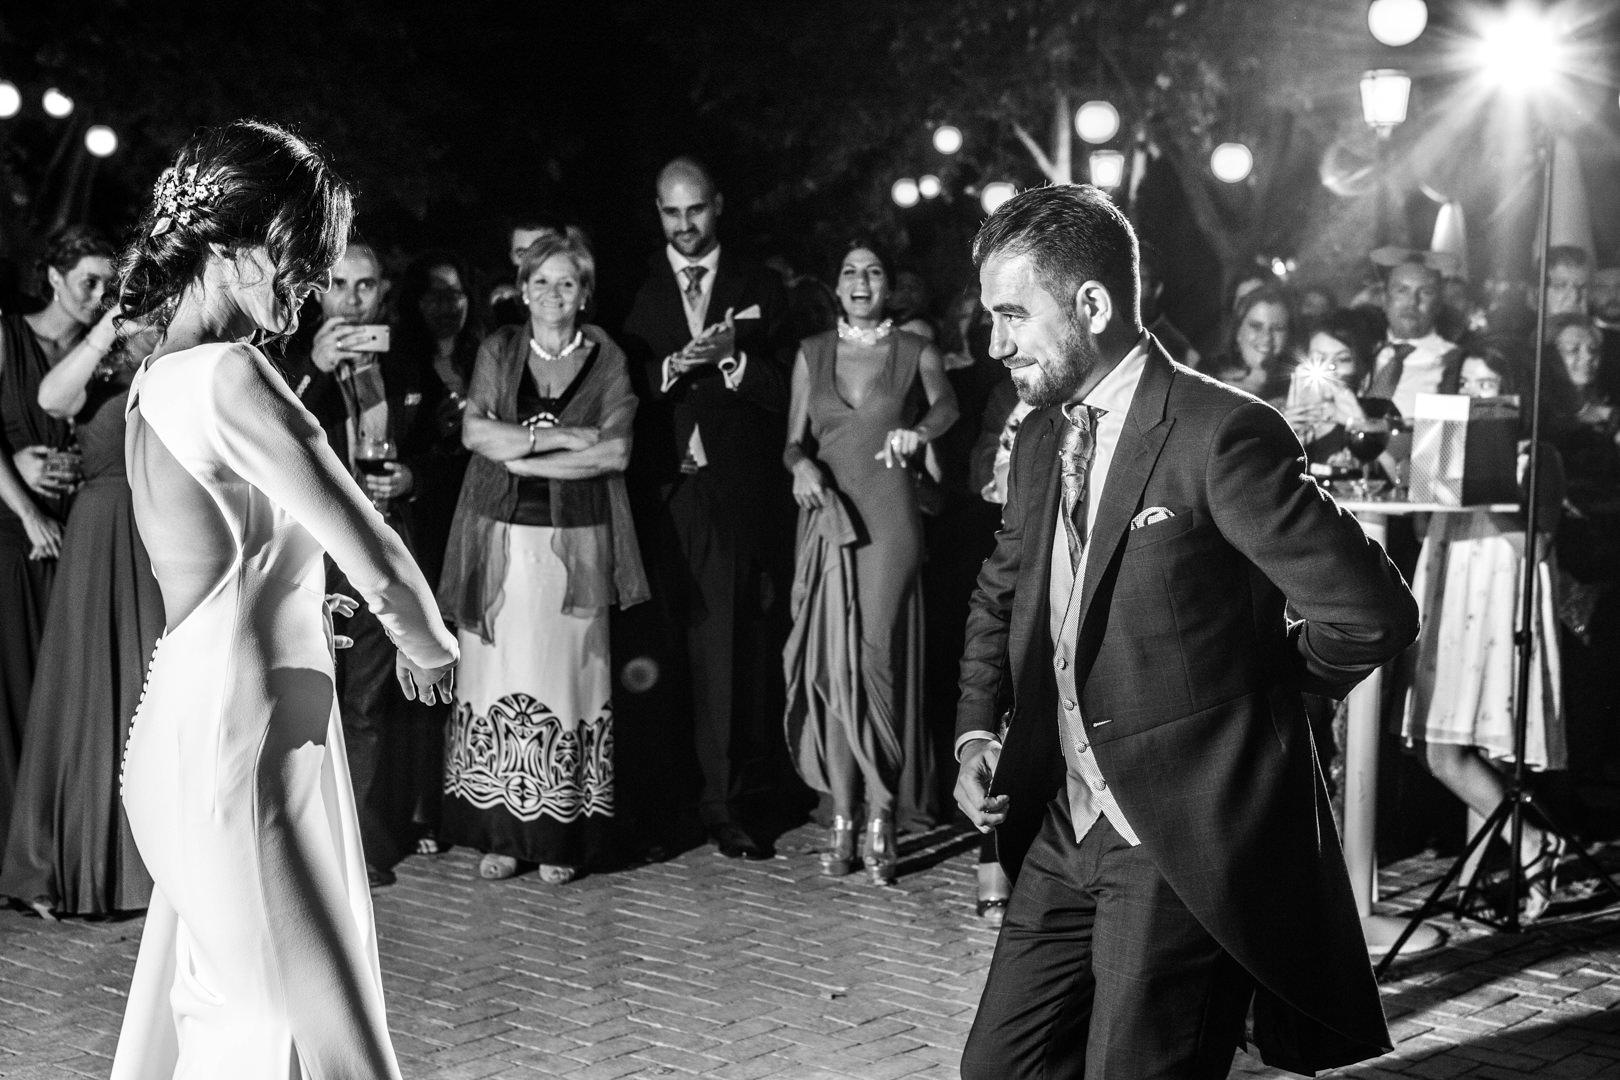 Boda-Irene-Marcos-Dos-Hermanas-Finca-Clotidle-engagement-Rafael-Torres-fotografo-bodas-sevilla-madrid-barcelona-wedding-photographer--34.jpg